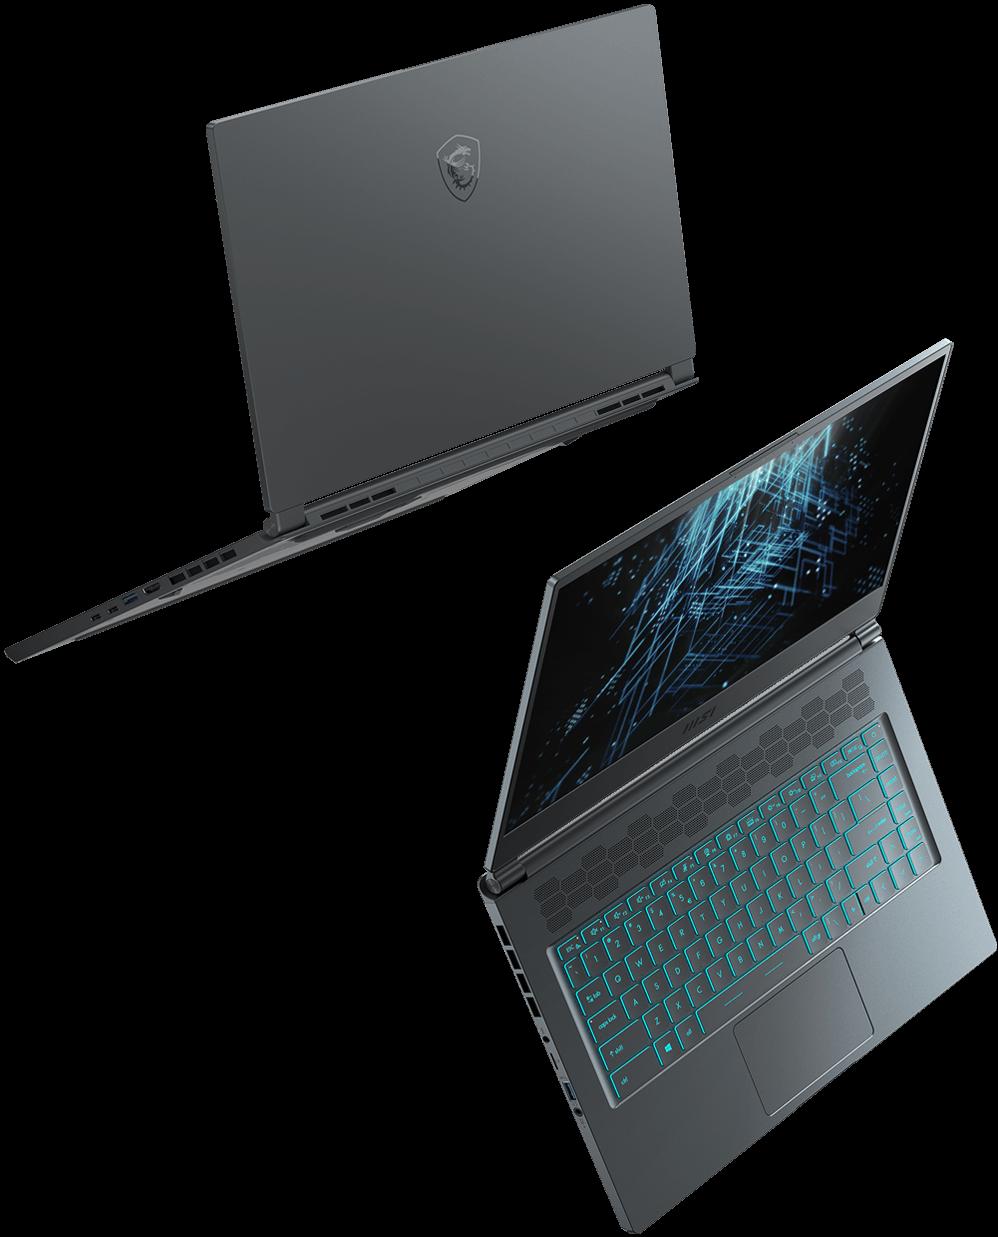 msi stealth 15m light laptop